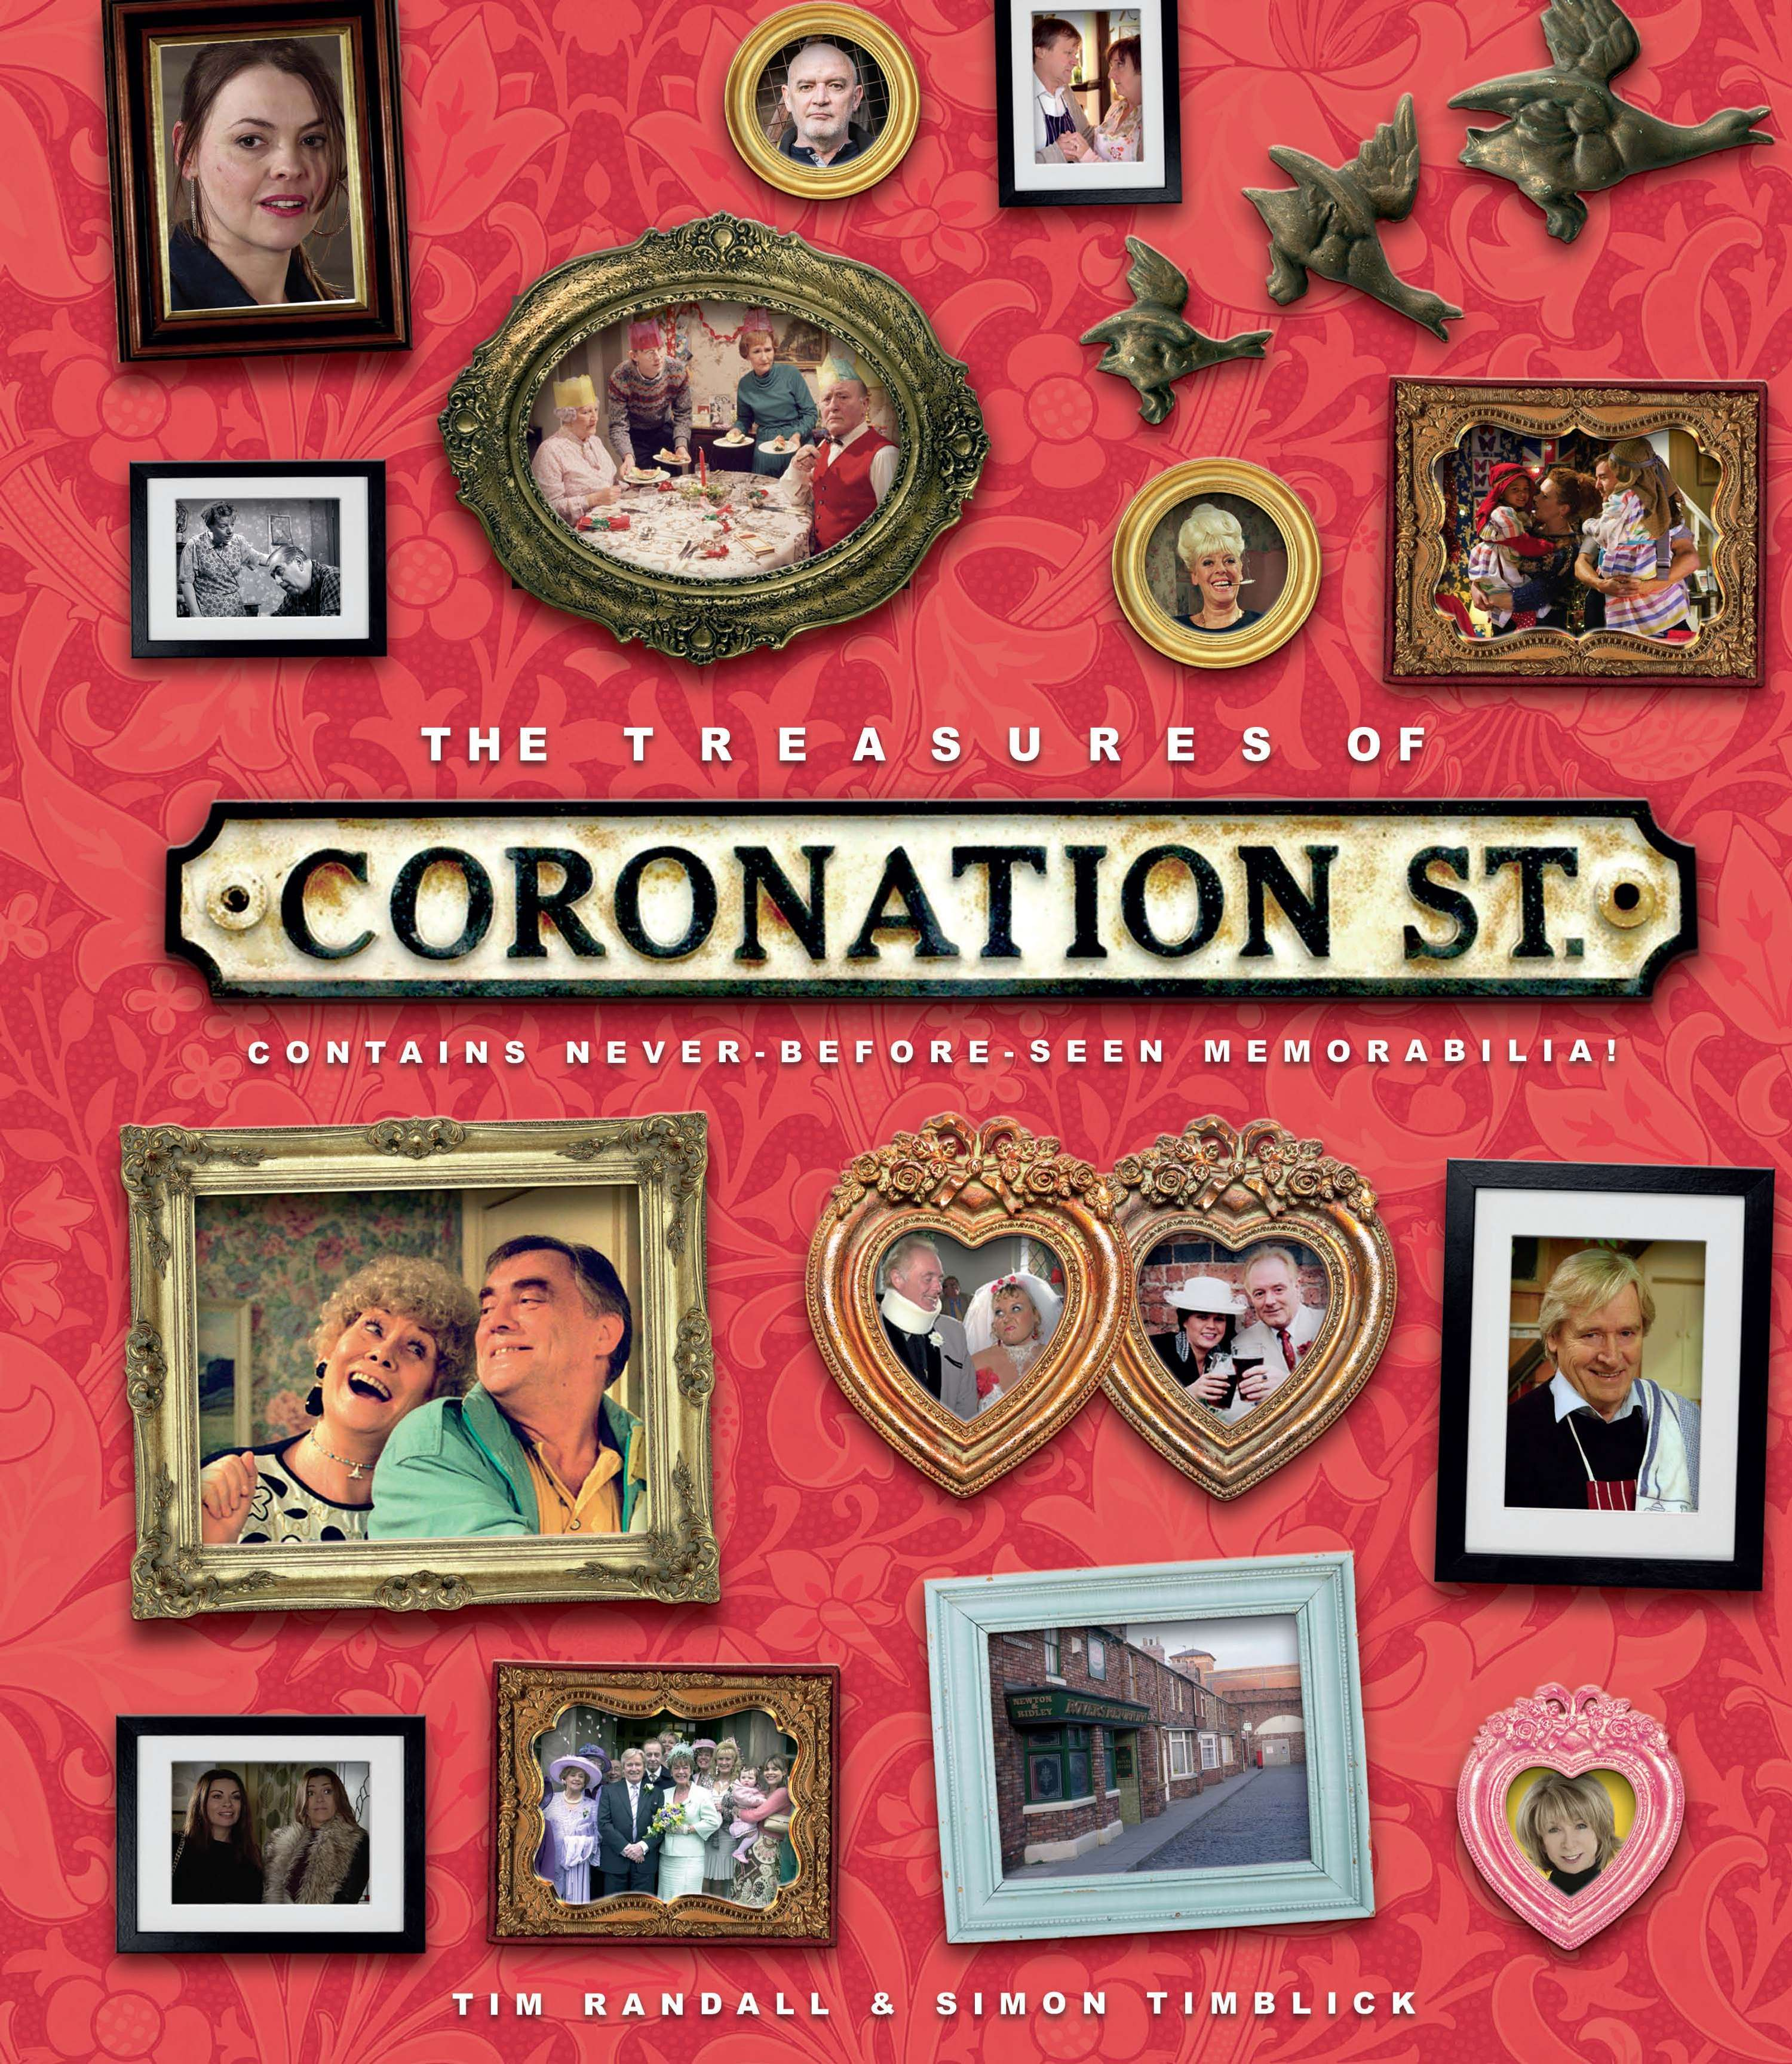 The Treasures Of Coronation Street (Carlton Books, 2018